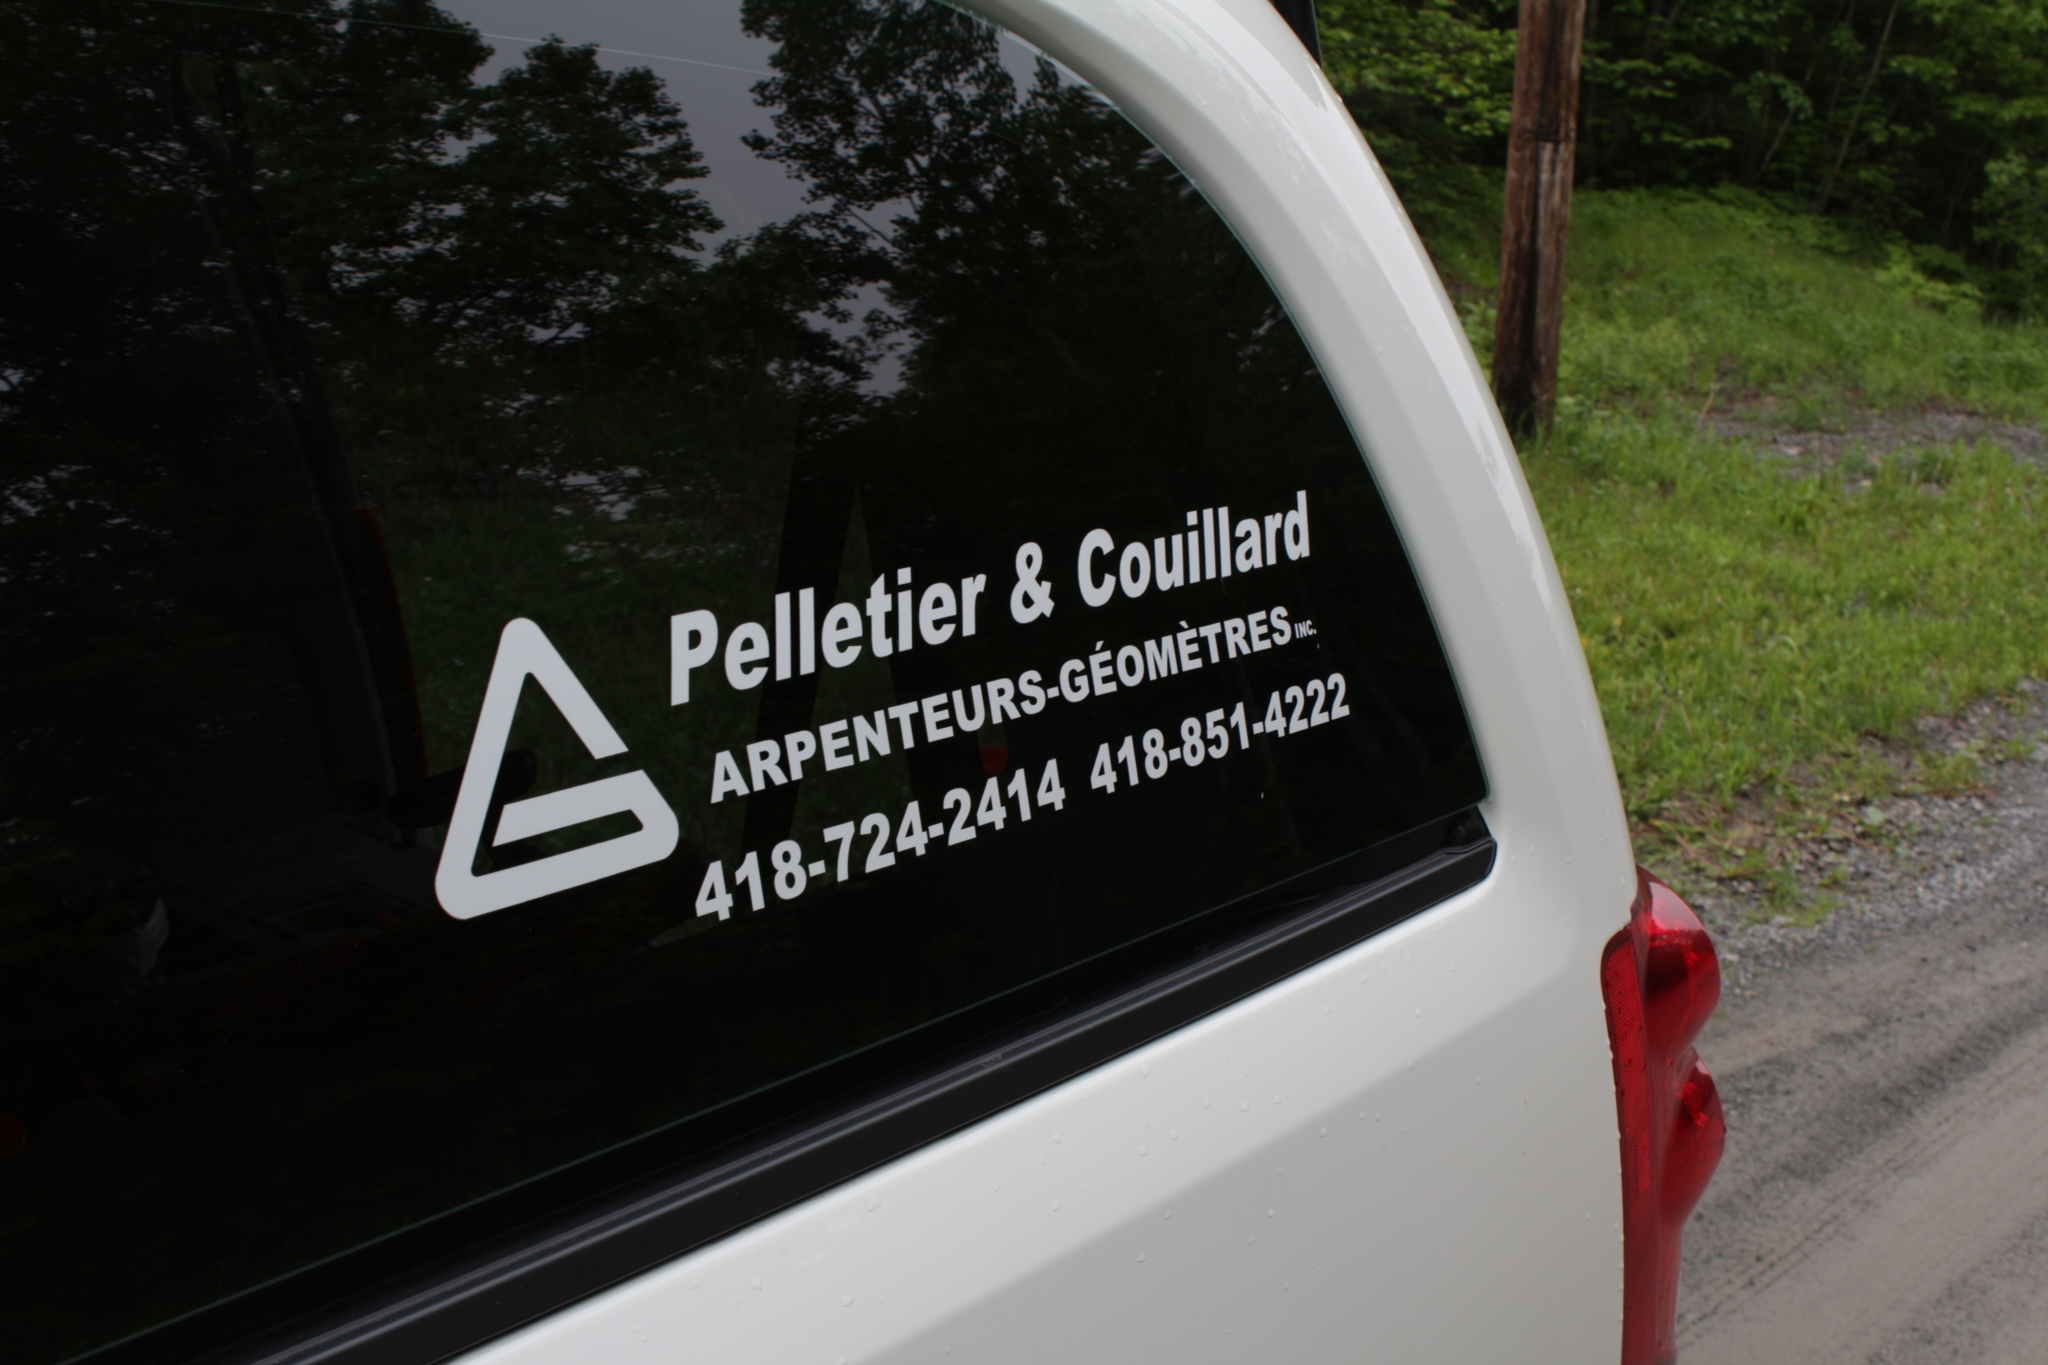 Pelletier & Couillard à Rimouski